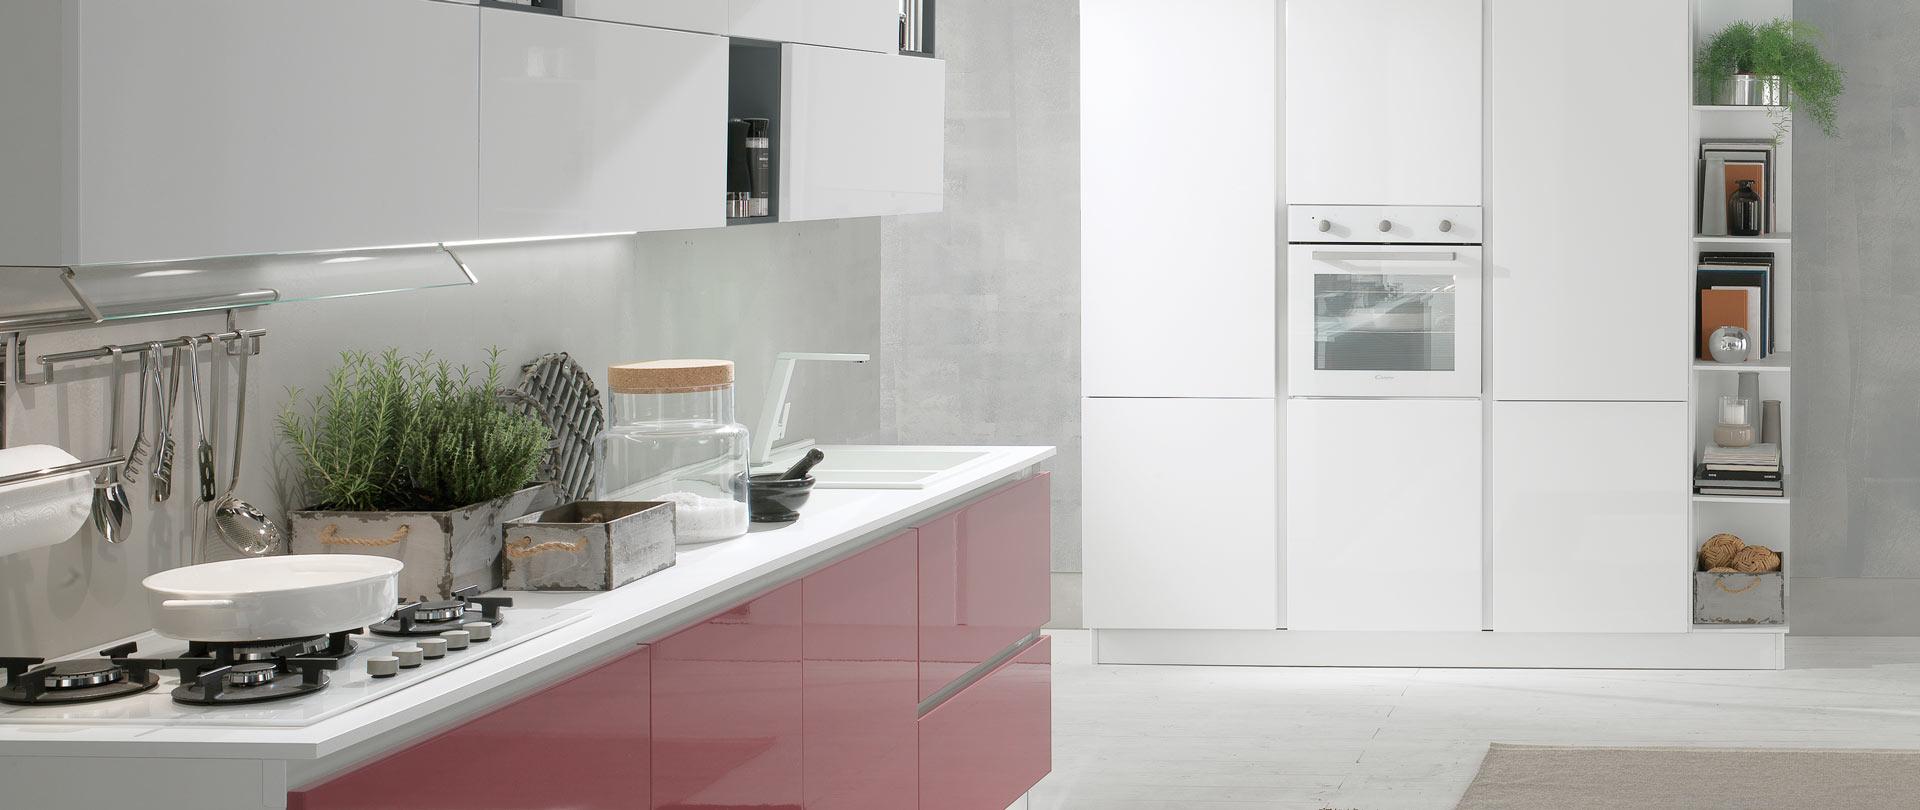 02-evo-cucina-aurora-con-gola-bianco-marsala-finitura-lucida